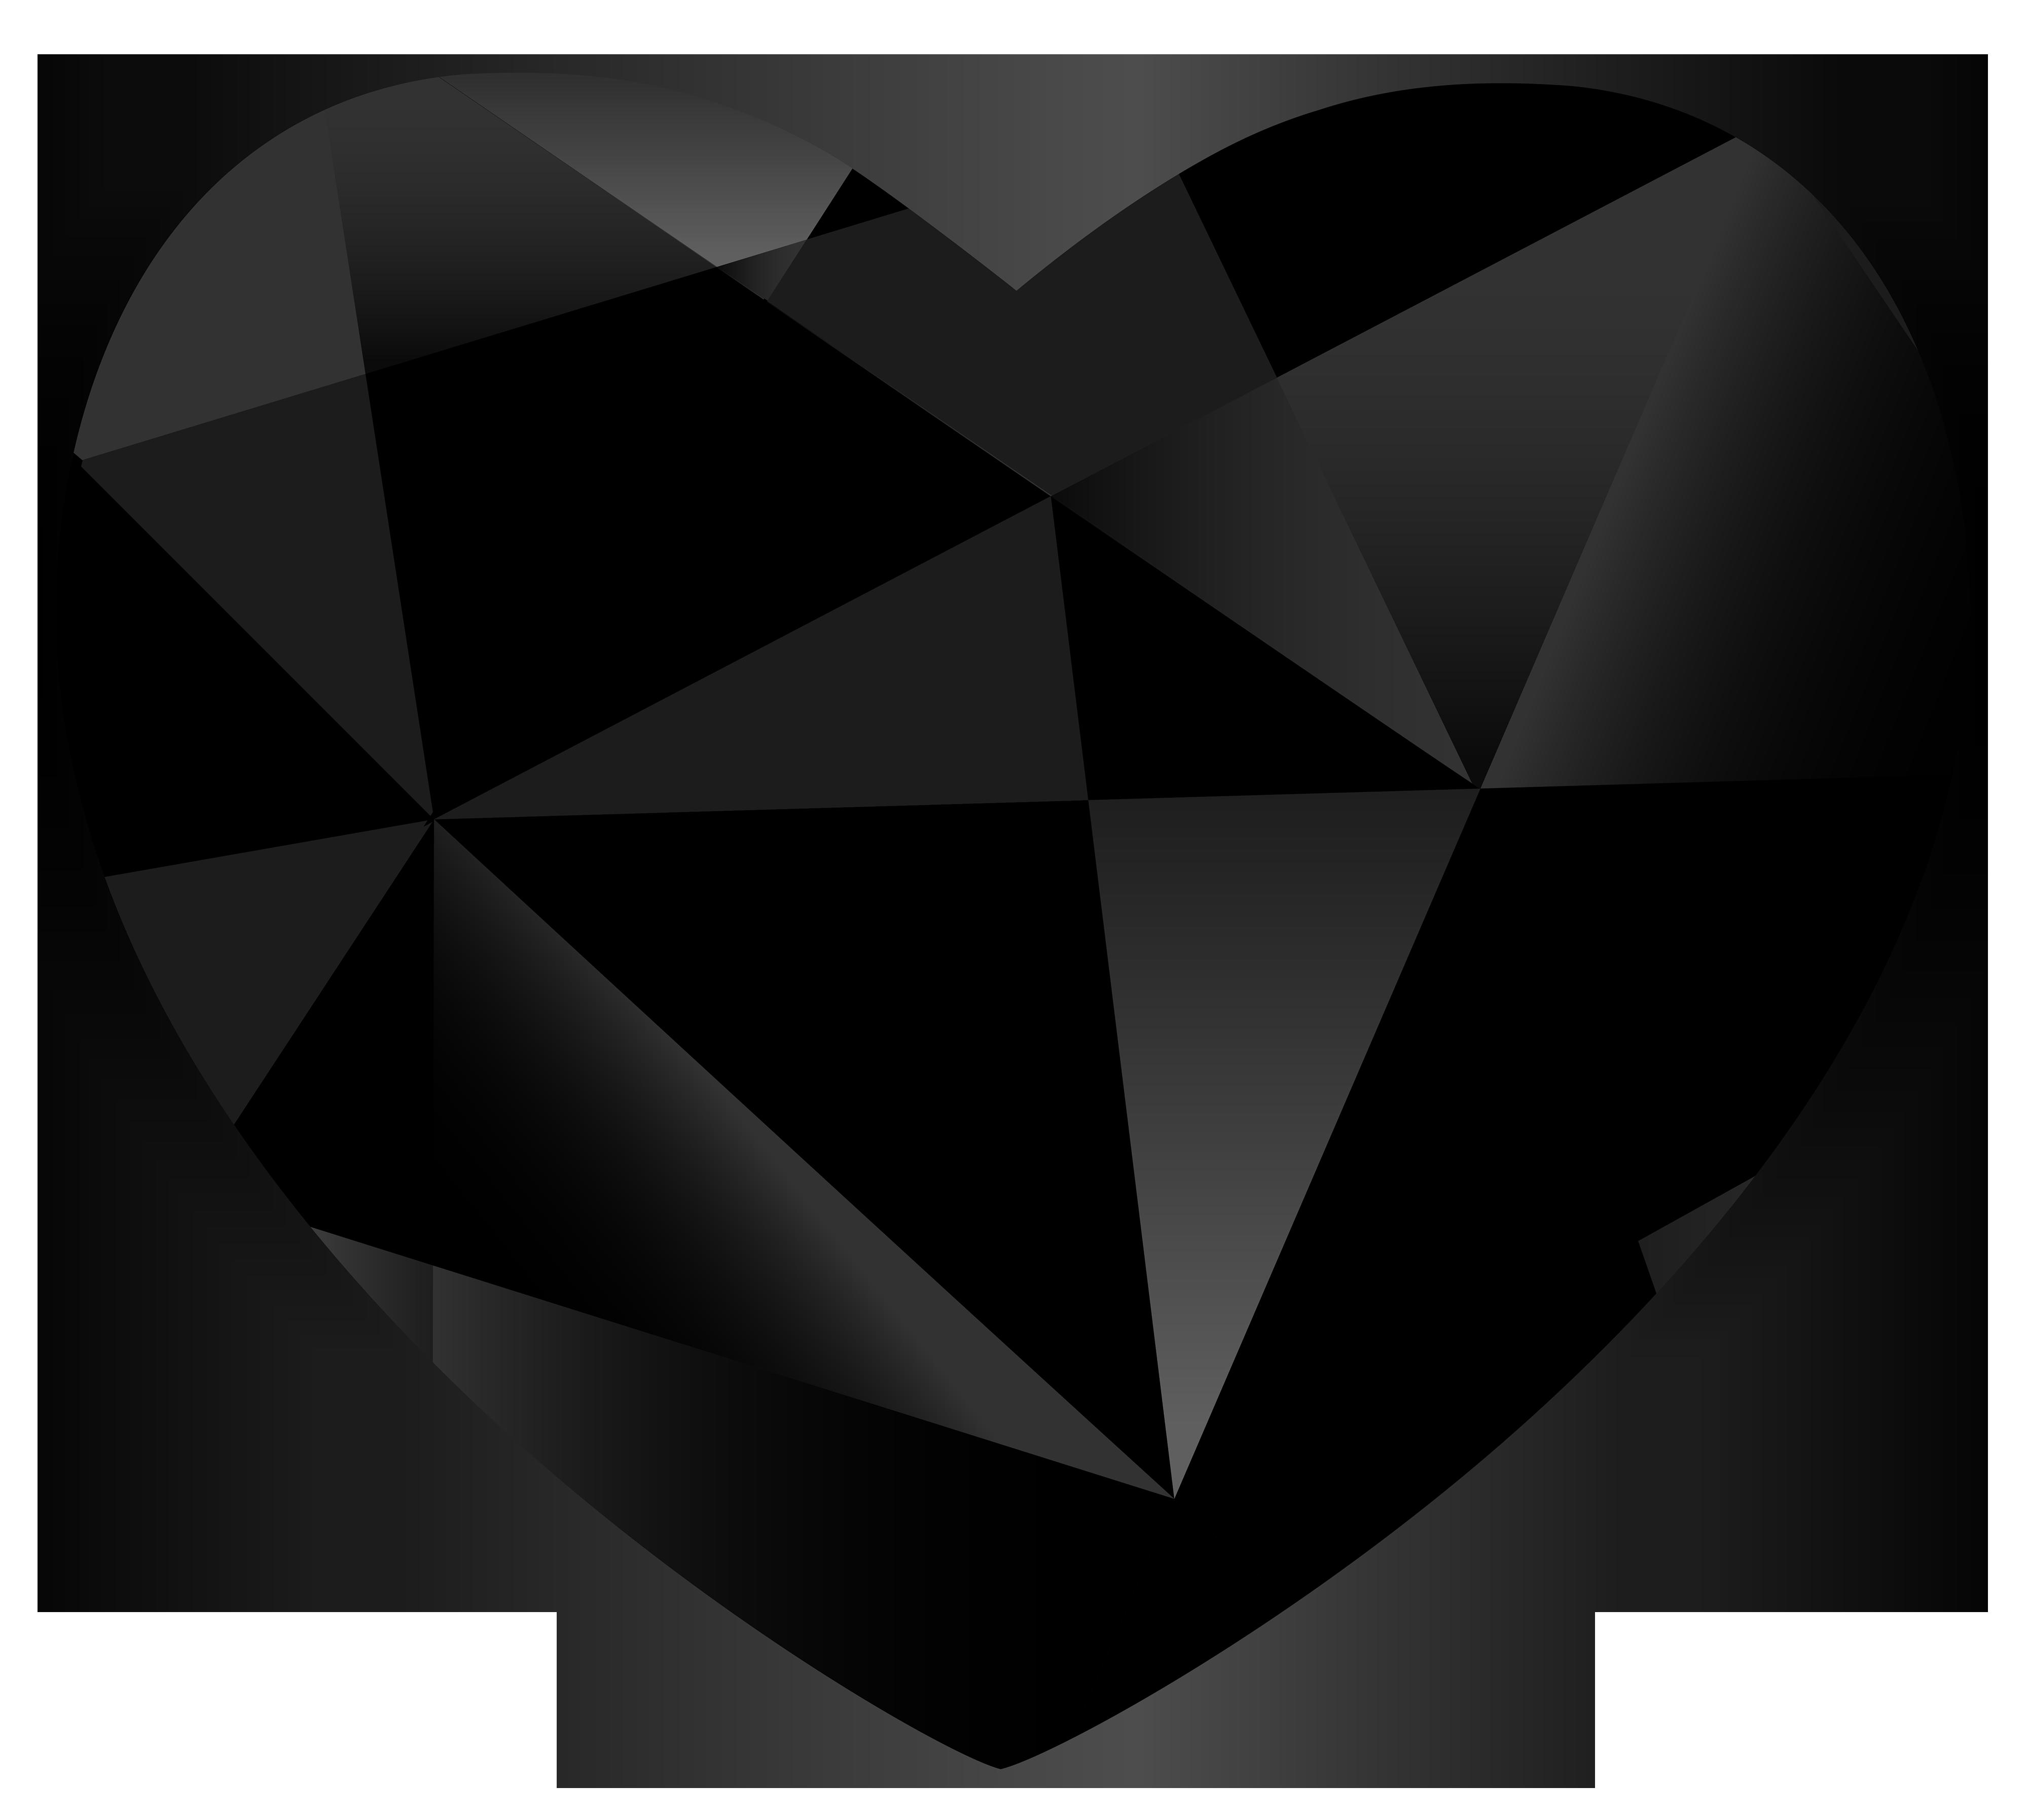 Black Gem Heart PNG Clipart.